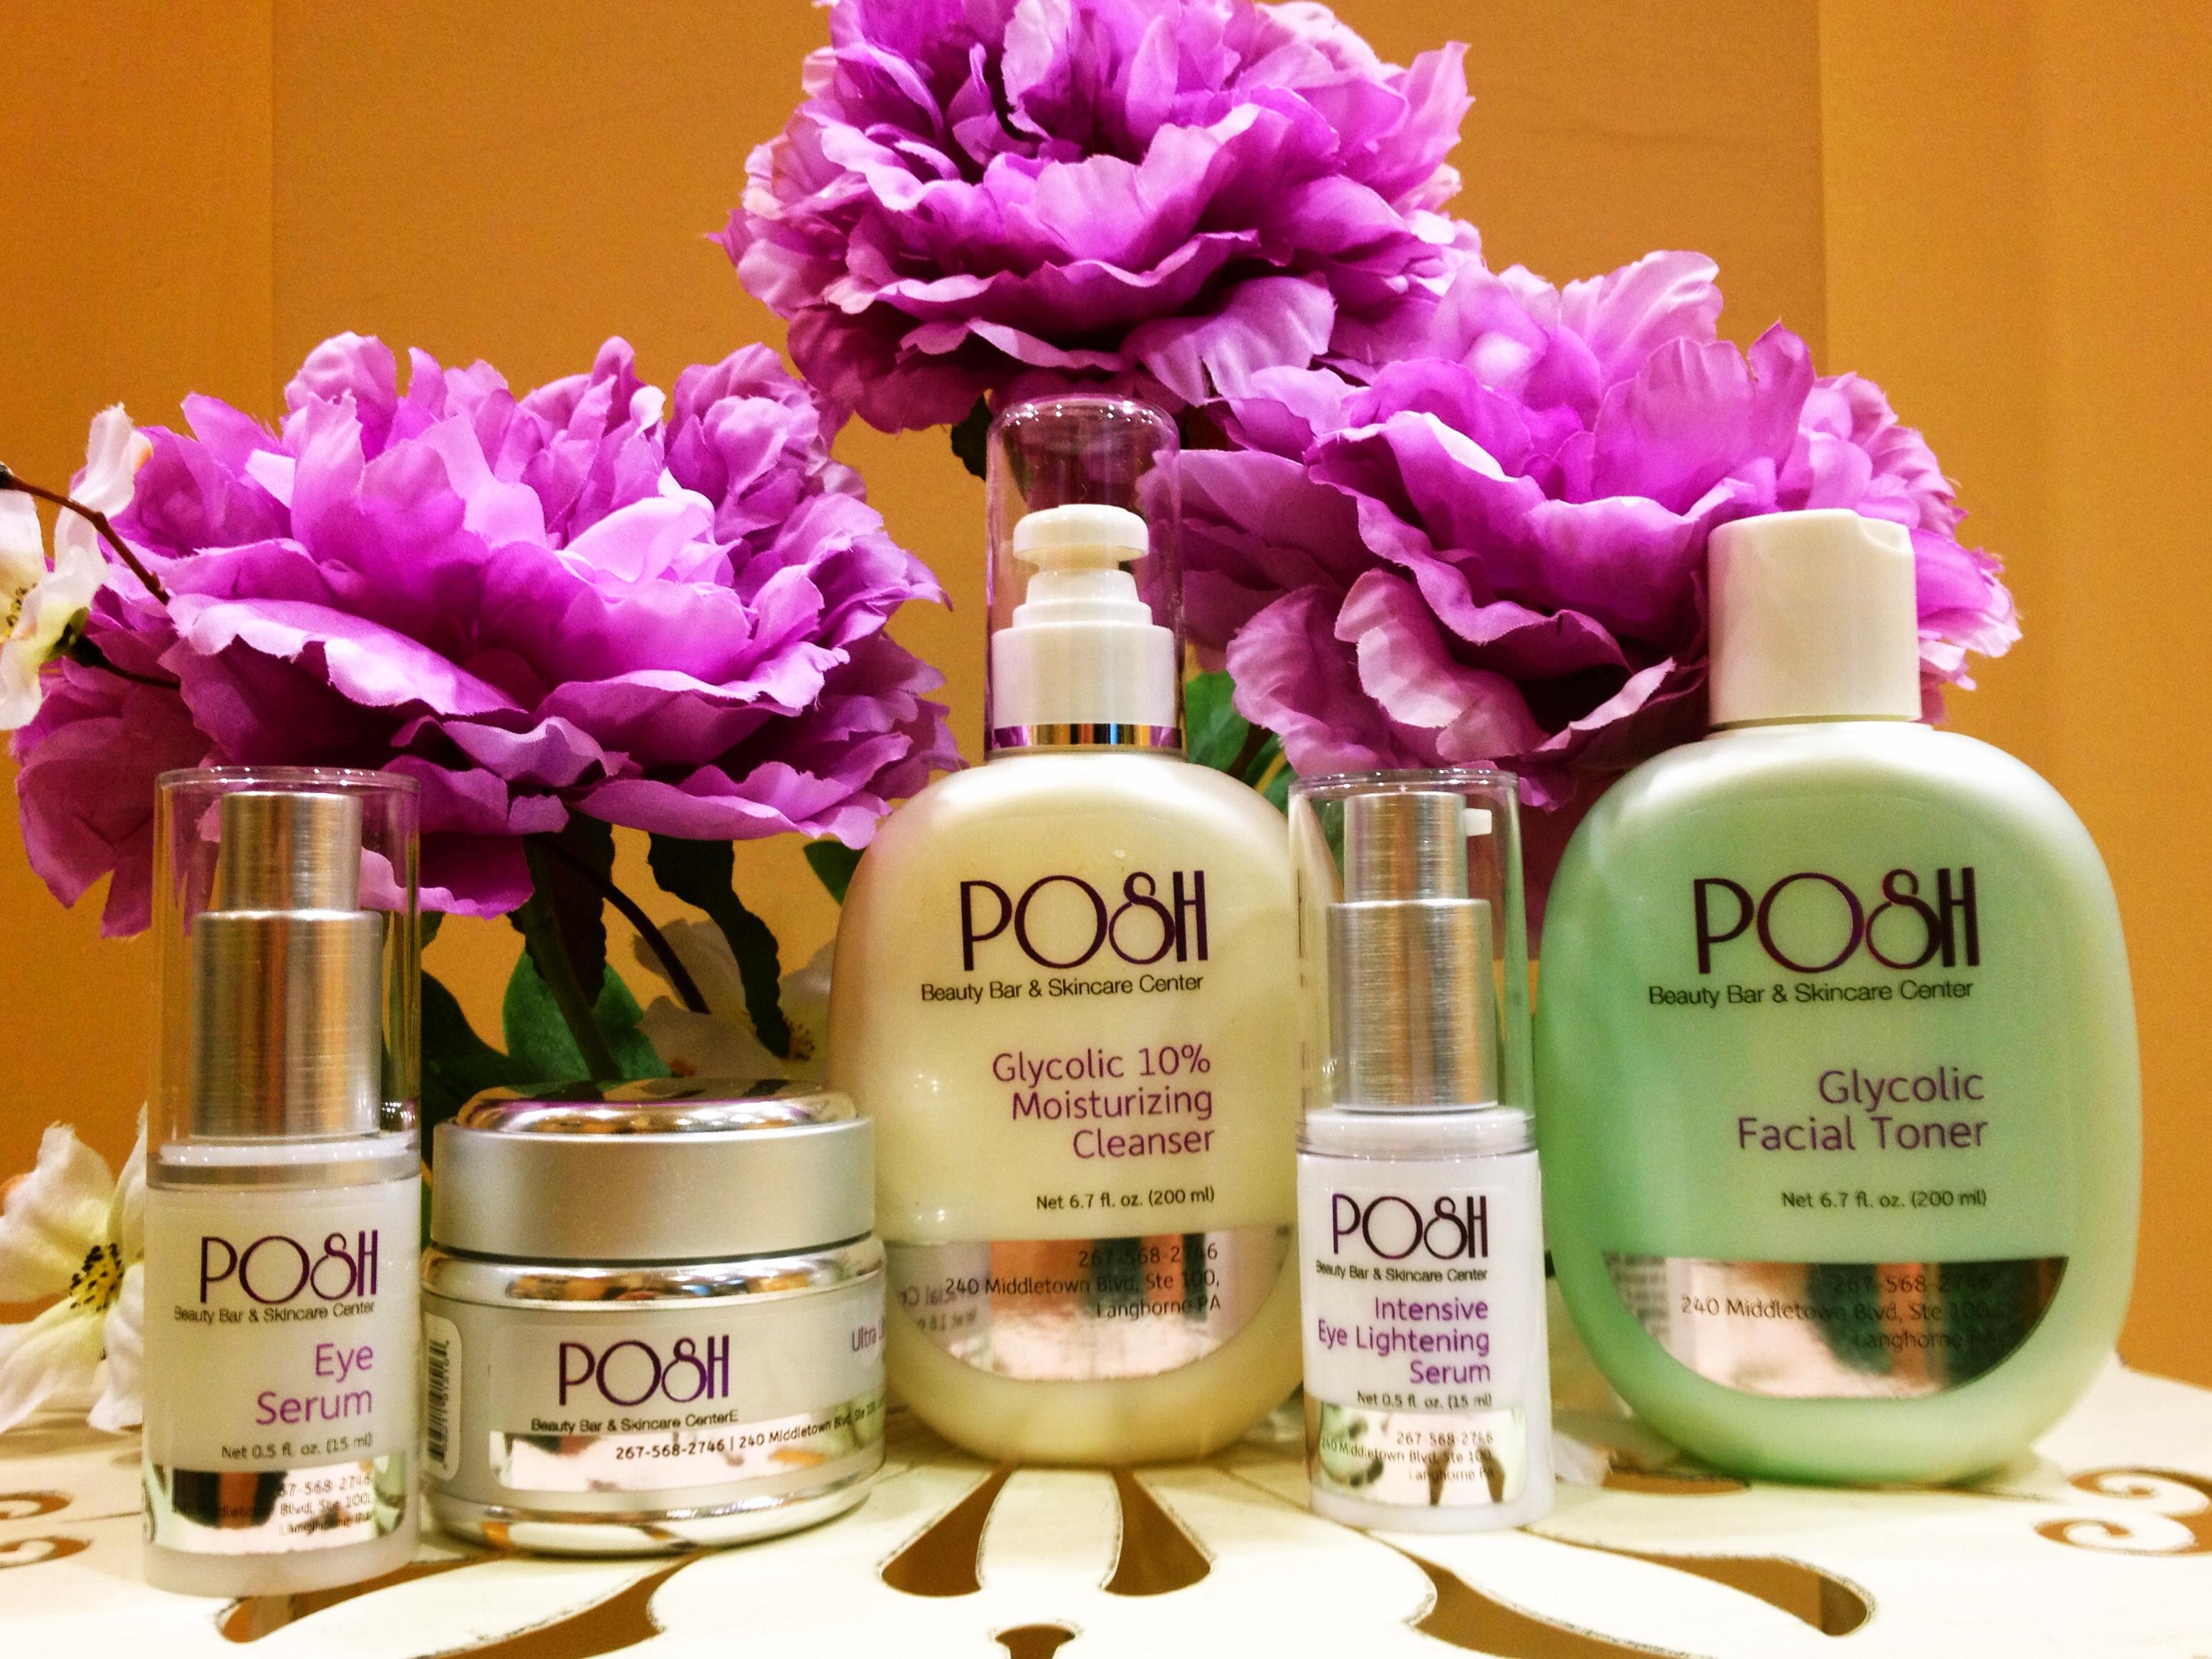 POSH Brand Products